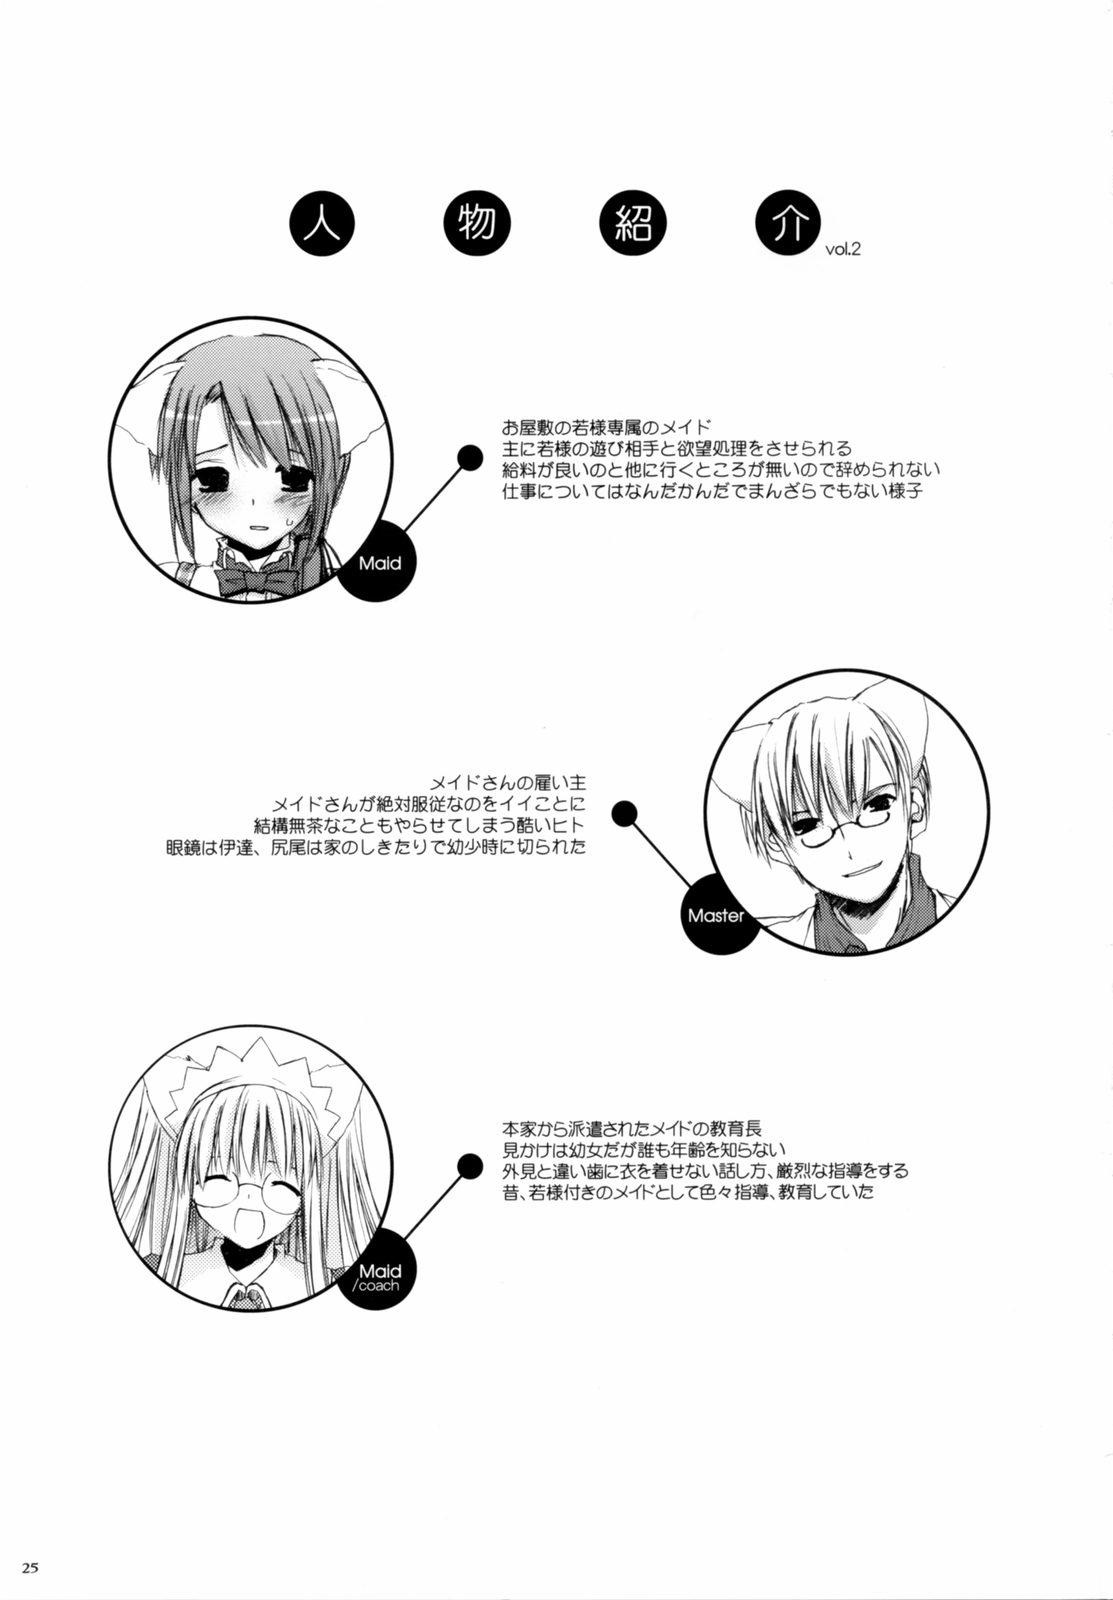 Seifuku Rakuen 13 - Costume Paradise 13 23